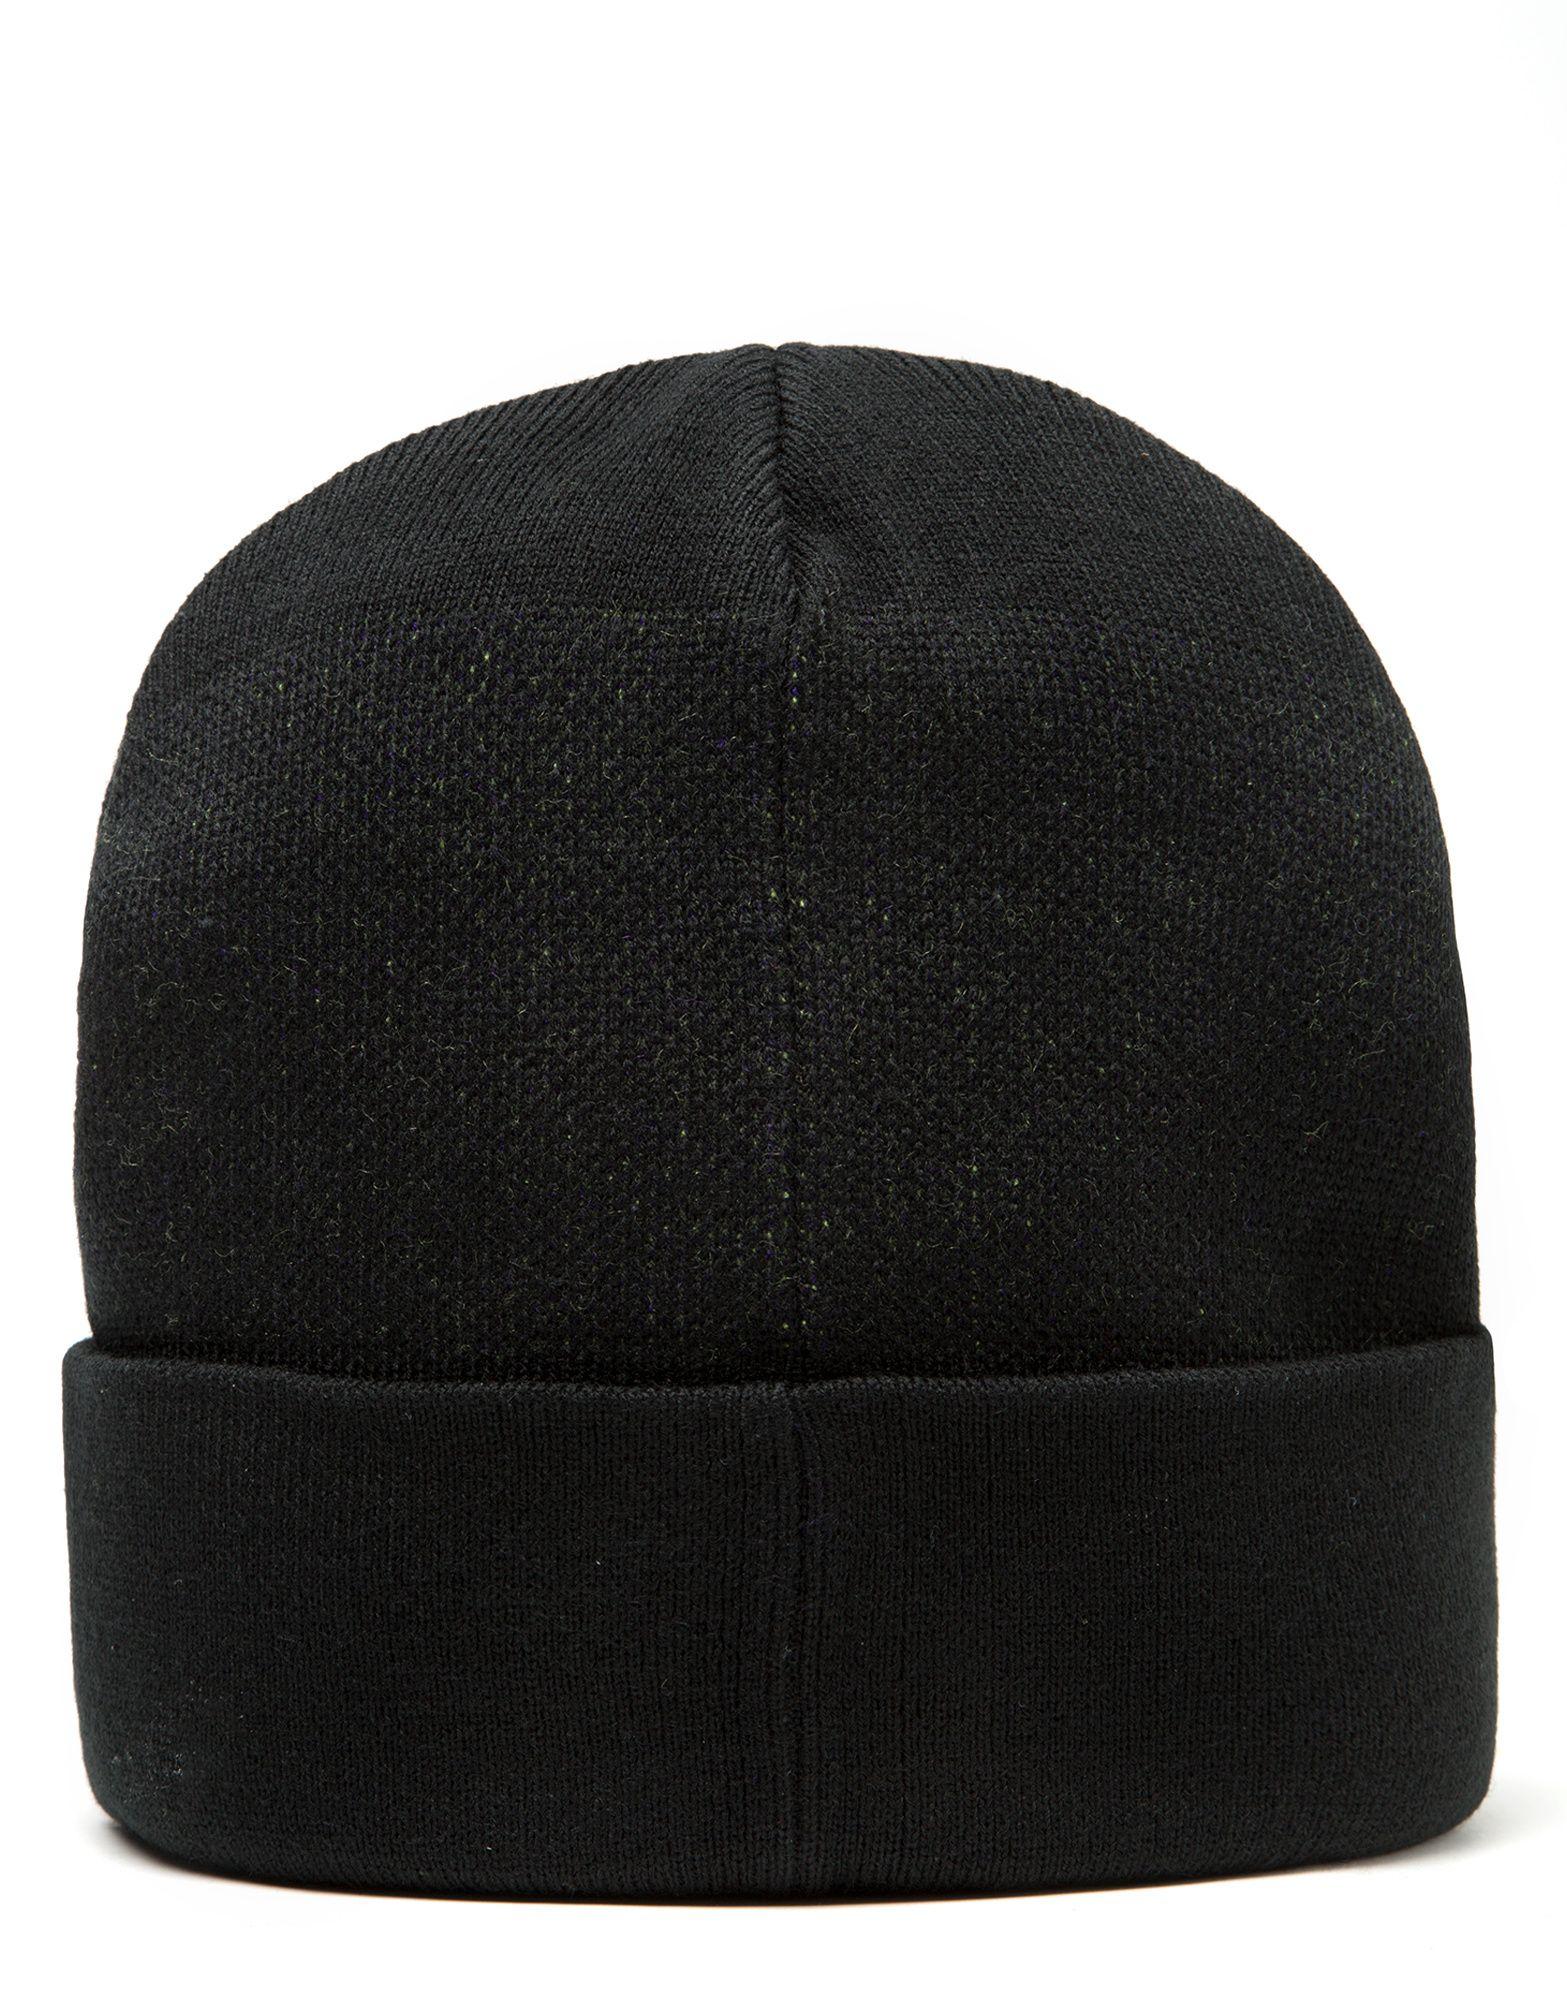 Beck and Hersey Dope Skills Beanie Hat